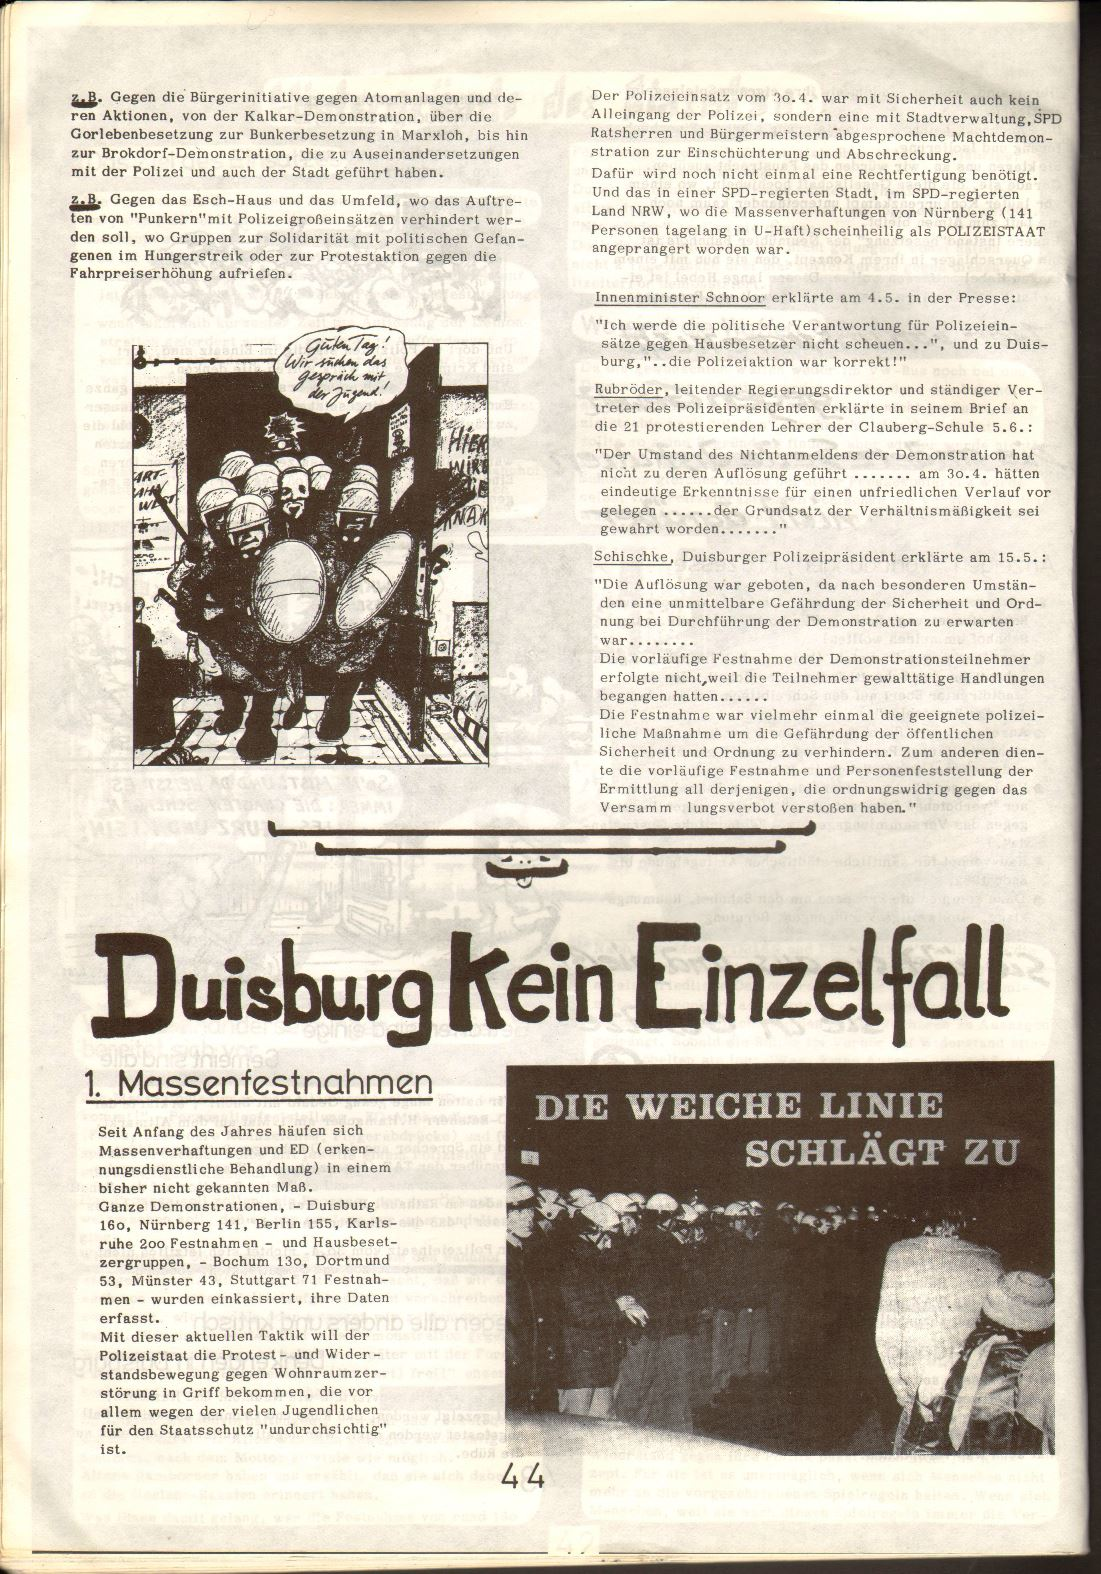 Duisburg_1981_Doku_Neumuehler_Bahnhof_44